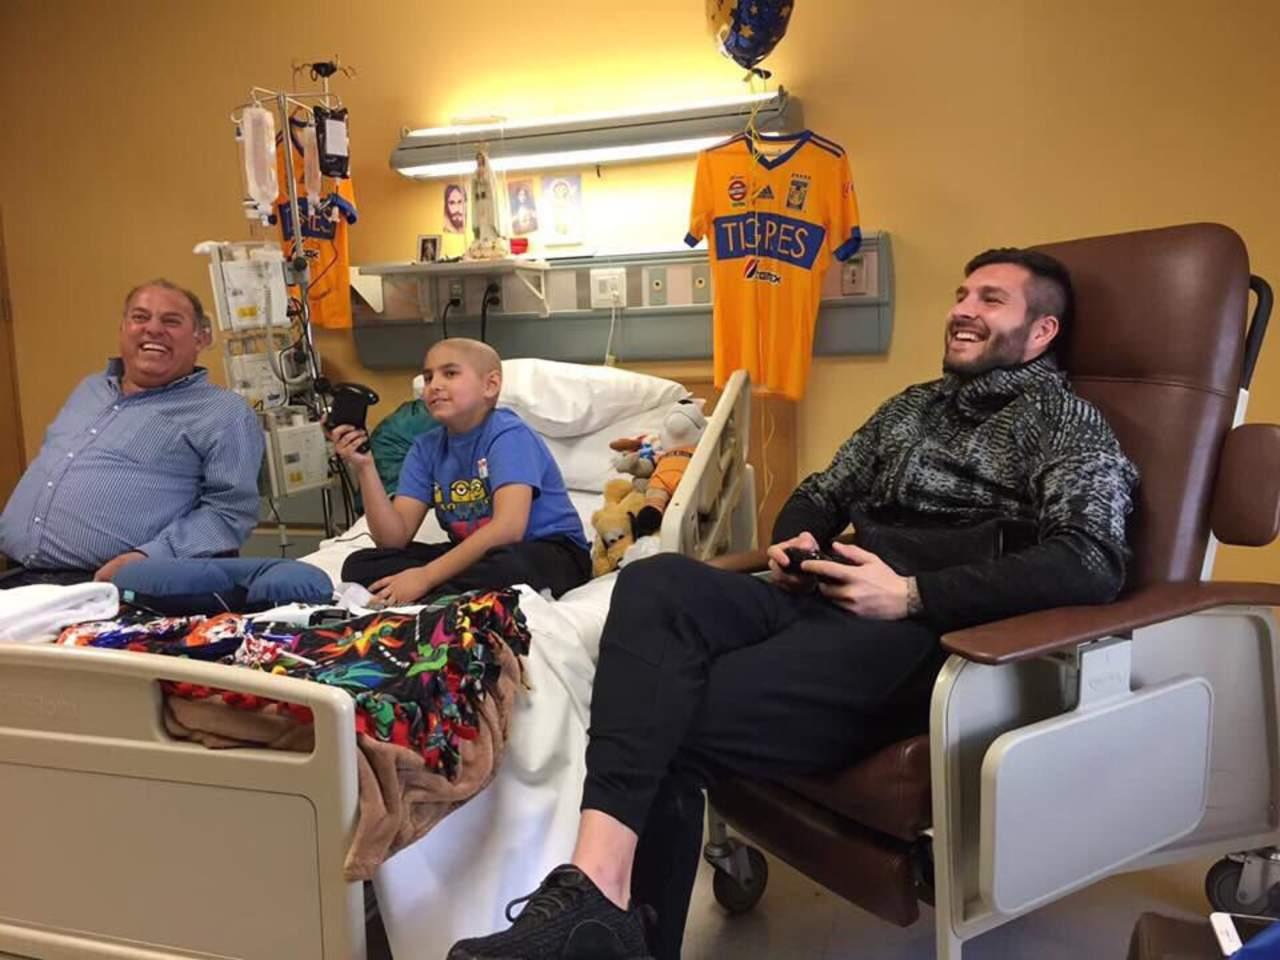 Gignac visita a niño enfermo de cáncer